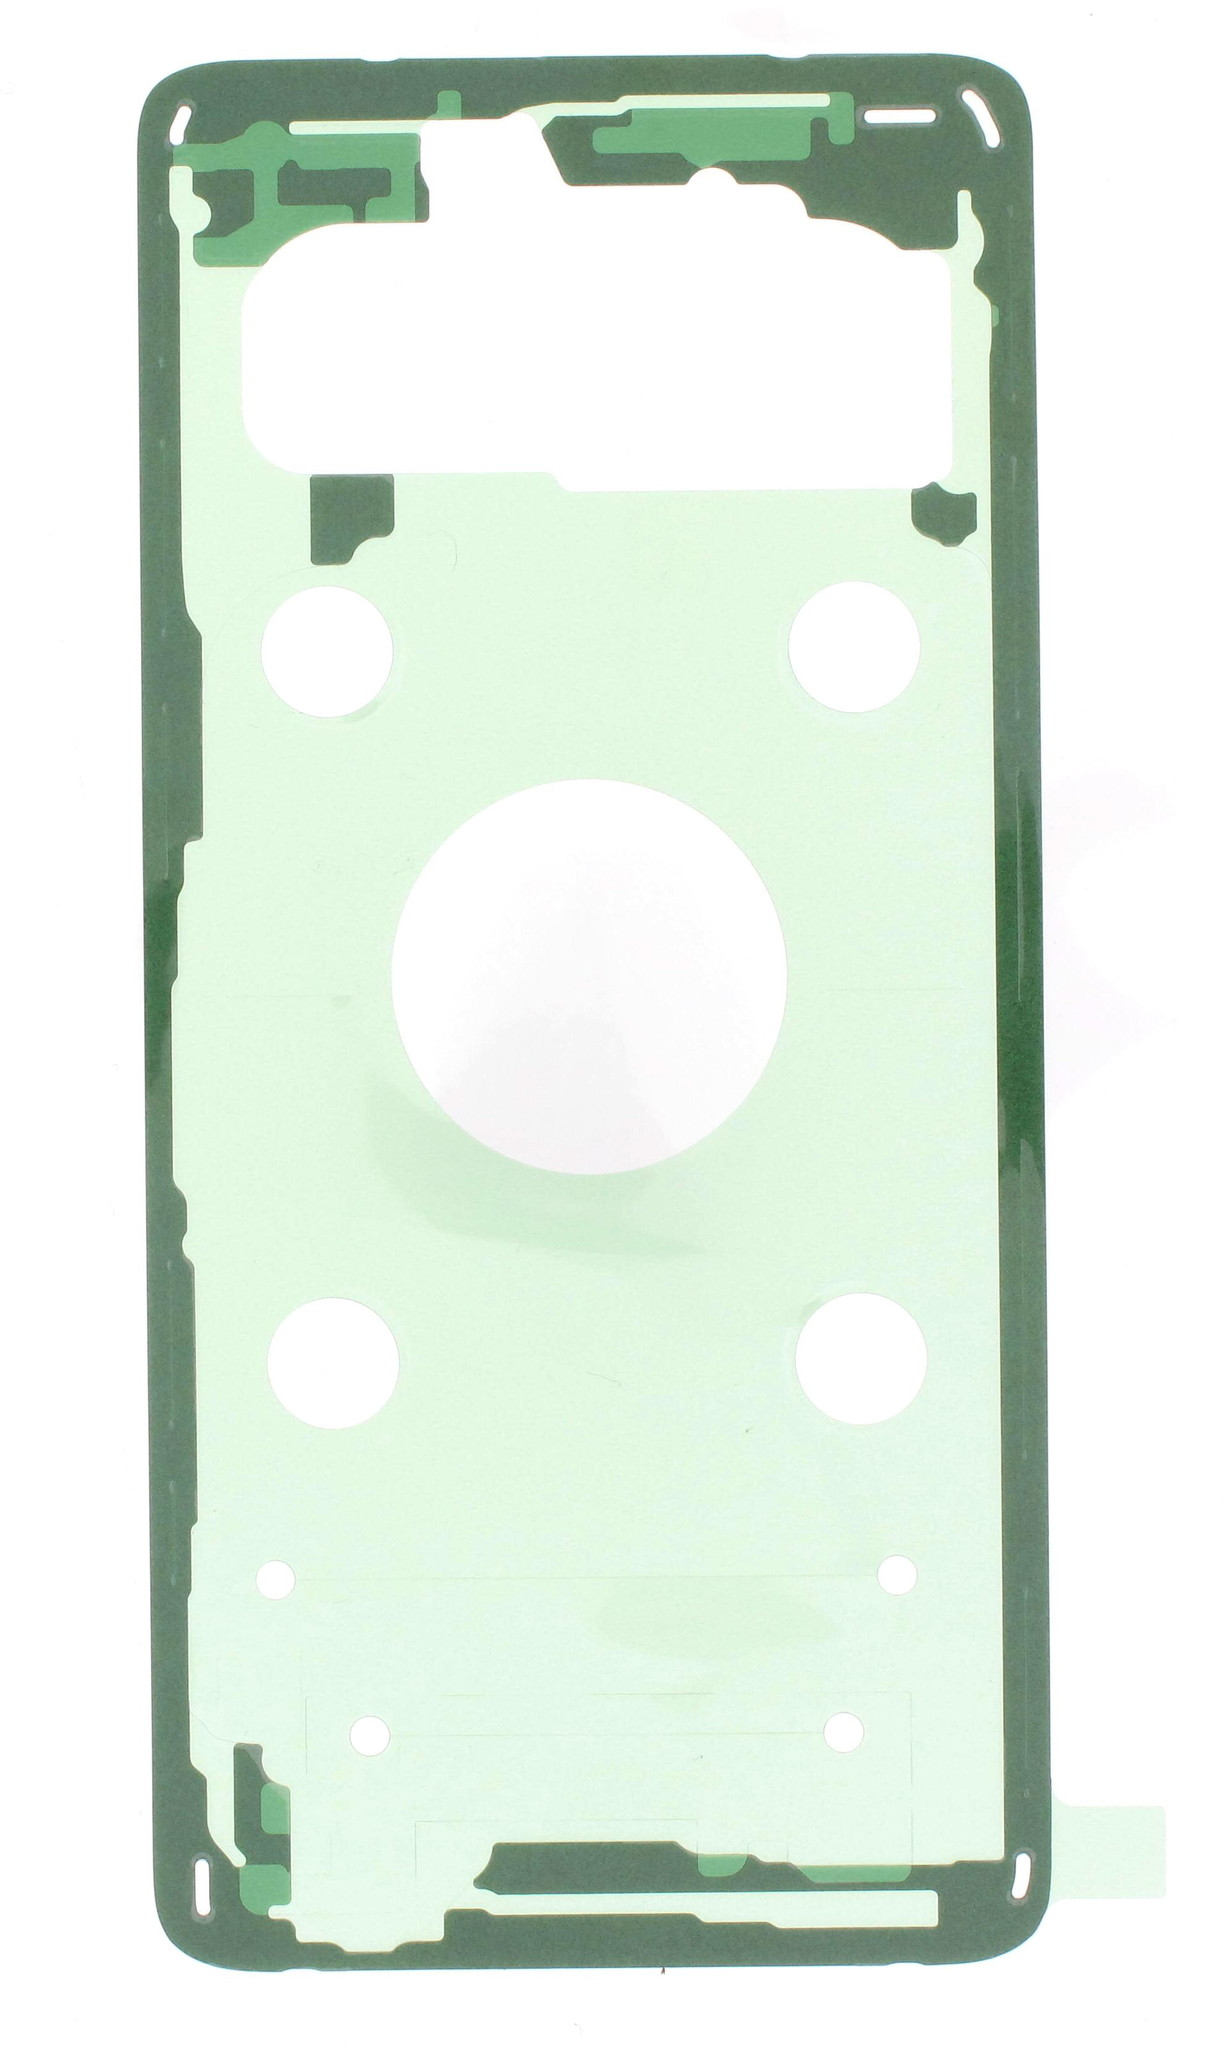 Samsung Galaxy S10 Adhesive Sticker, Waterproof Tape